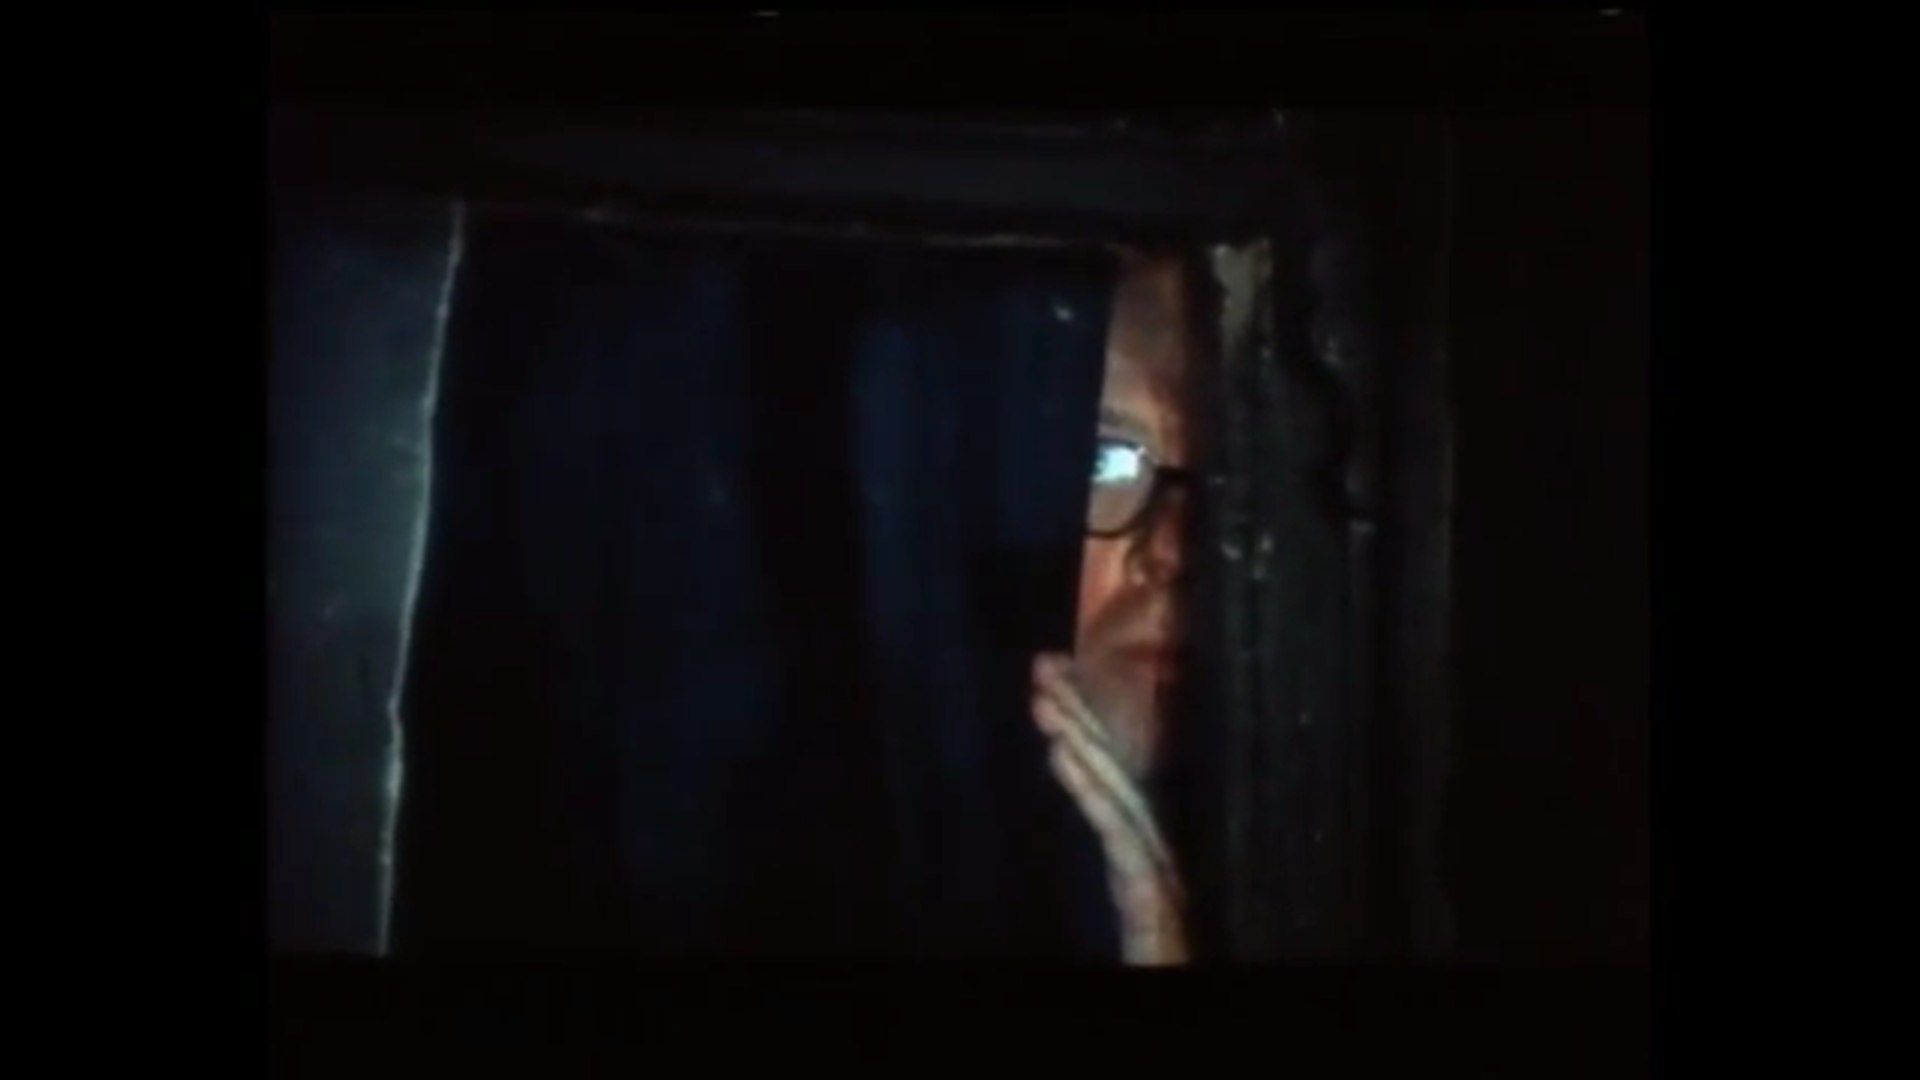 10 Rillington Place (1971) - Richard Attenborough, John Hurt - Trailer (Drama/Thriller)